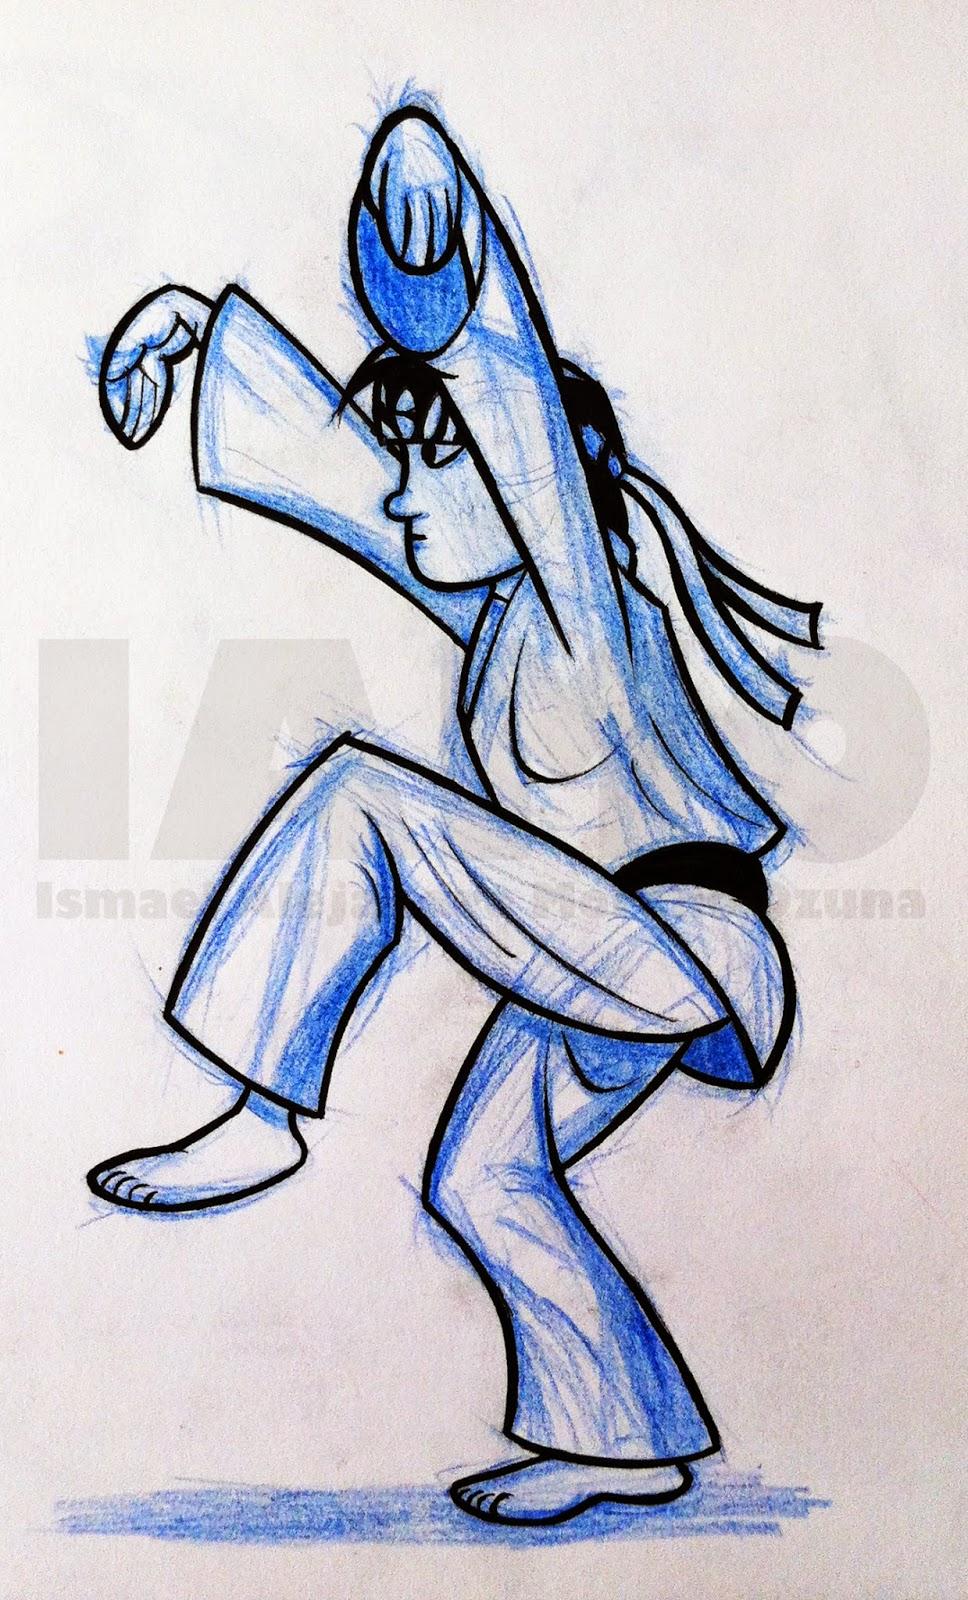 IAMO Karate Kid Crane Technique sketch